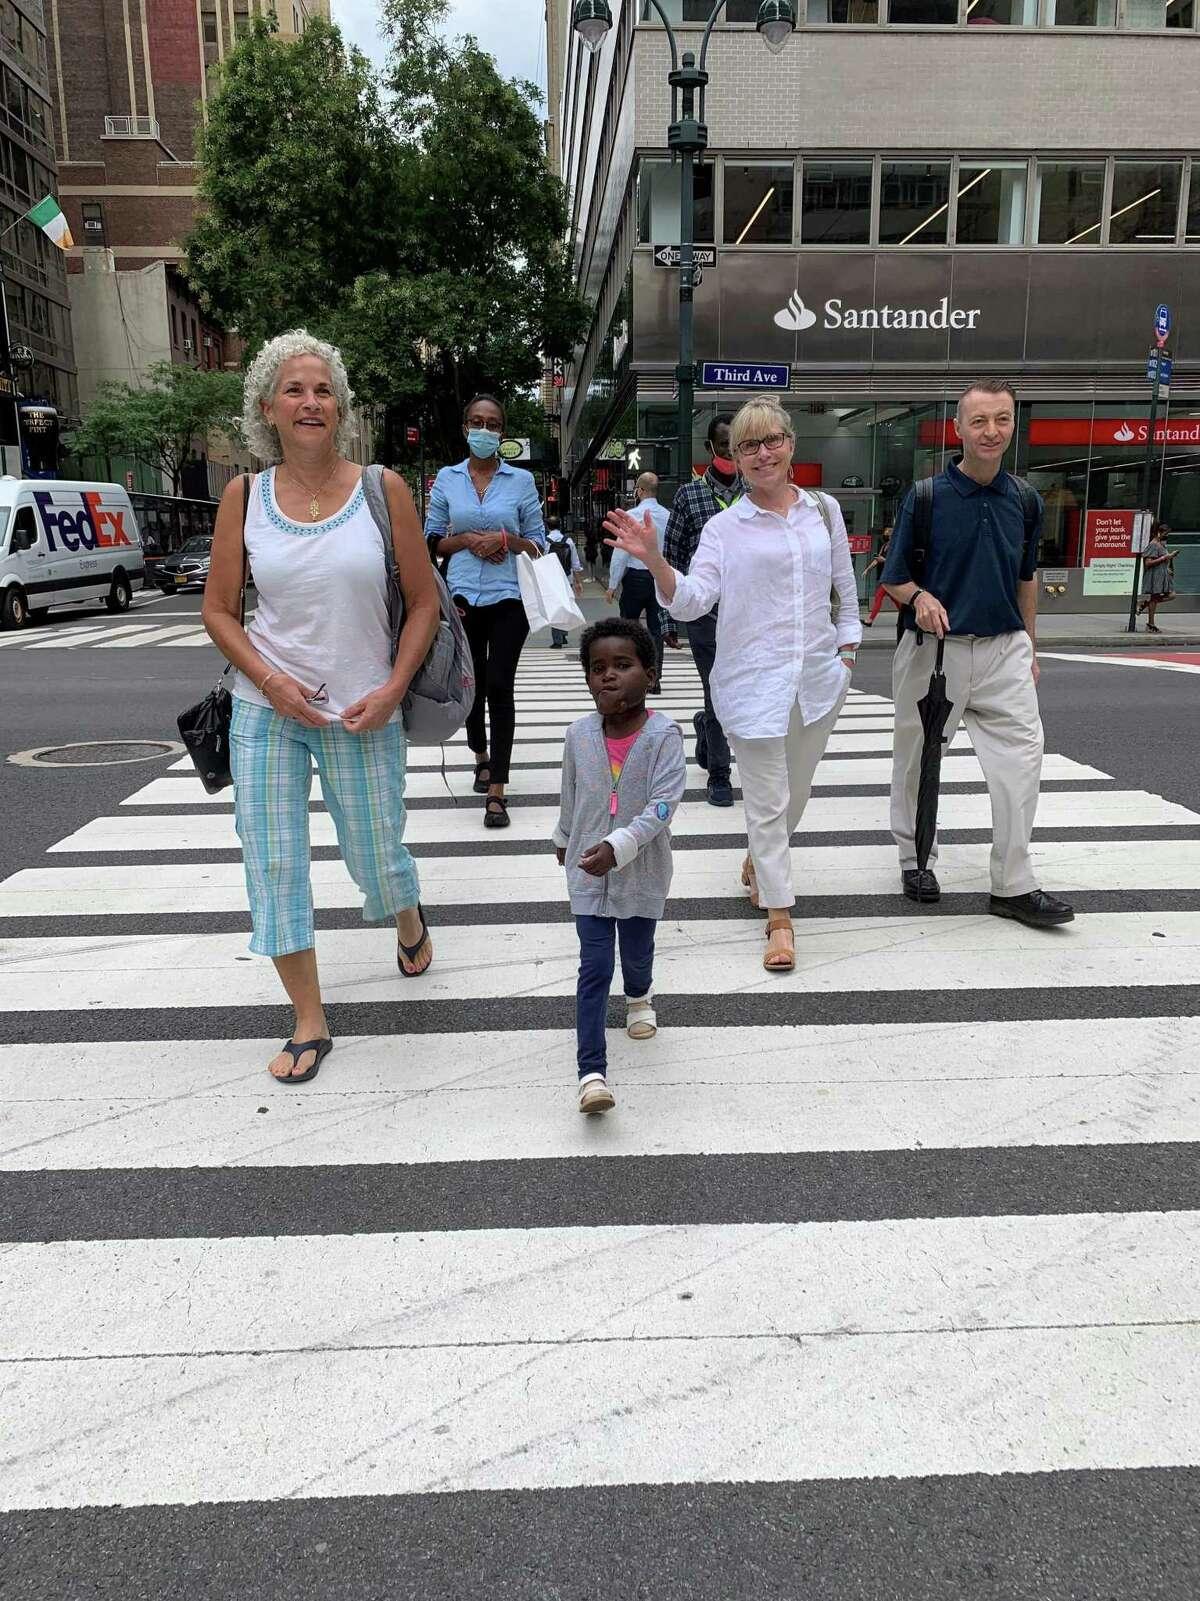 Nagalem leading the way across Third Avenue in New York.(L-R Susan Ketigian, Kalkidan Gebremariam, Nagalem Alafa, Matios Alafa Haile, Casey Saussy, Patrick Brady.)